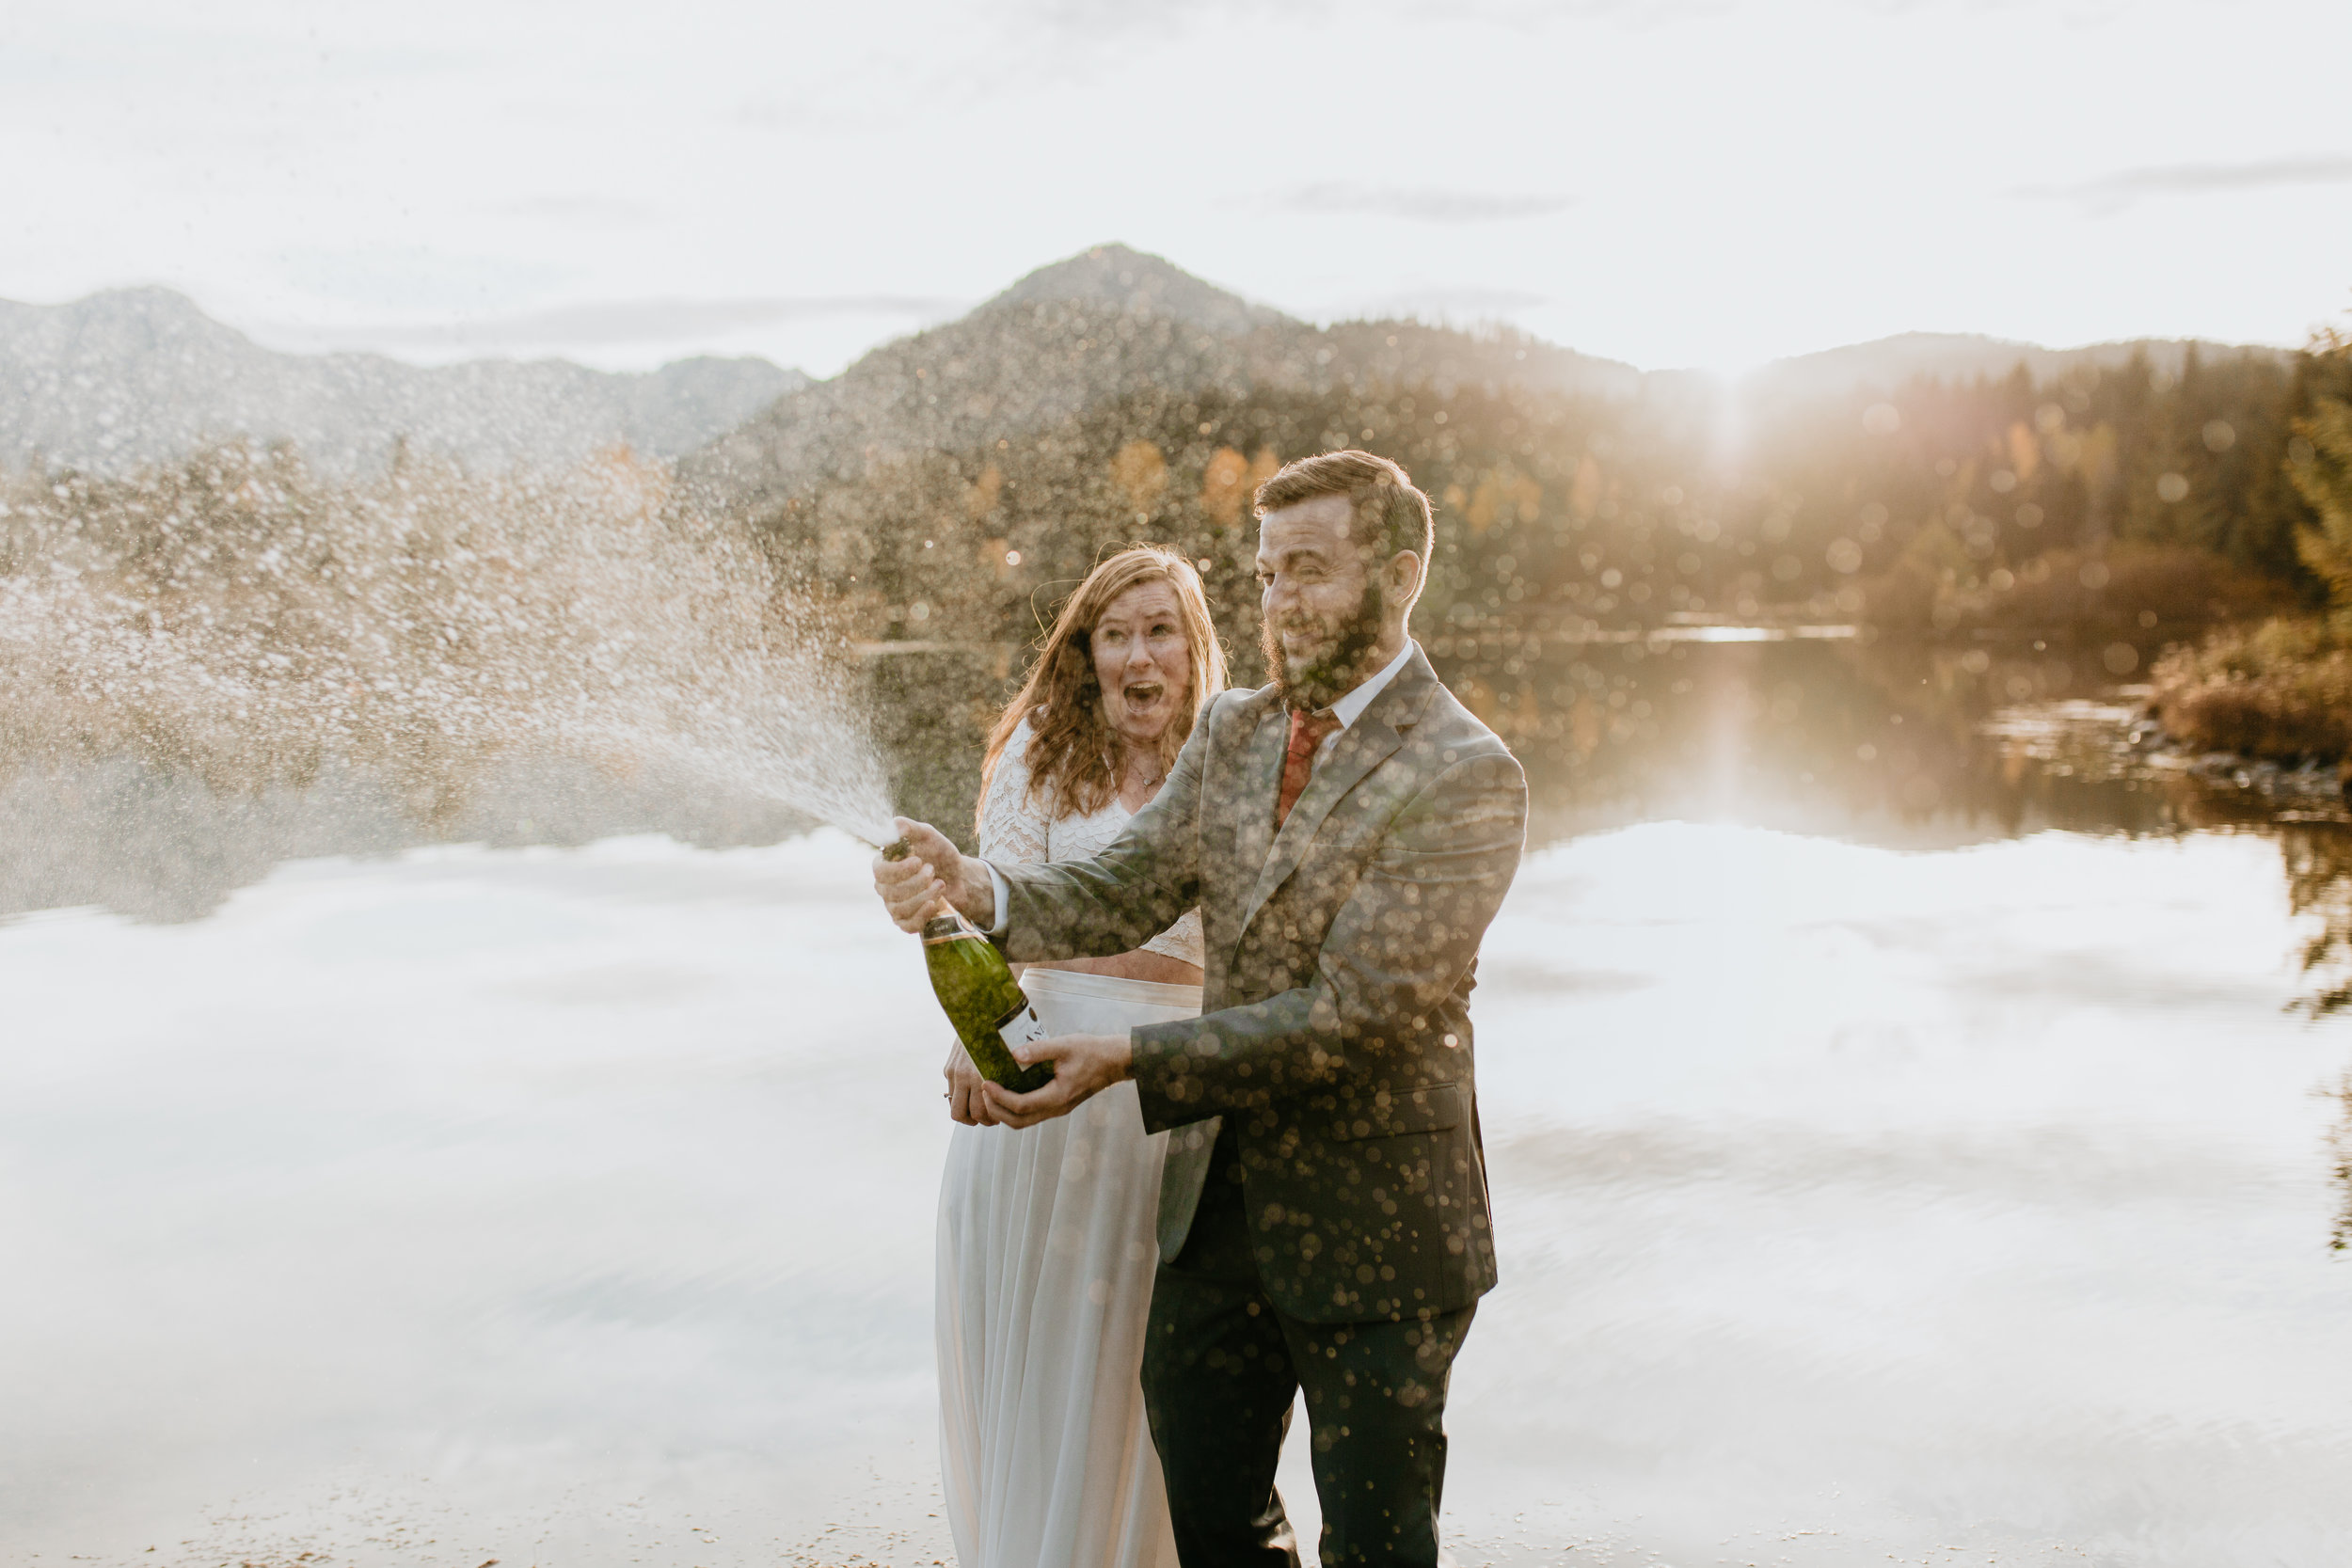 nicole-daacke-photography-mountain-view-elopement-at-gold-creek-pond-snoqualmie-washington-wa-elopement-photographer-photography-adventure-elopement-in-washington-fall-lakeside-golden-sunset-boho-fun-bride-0462.jpg